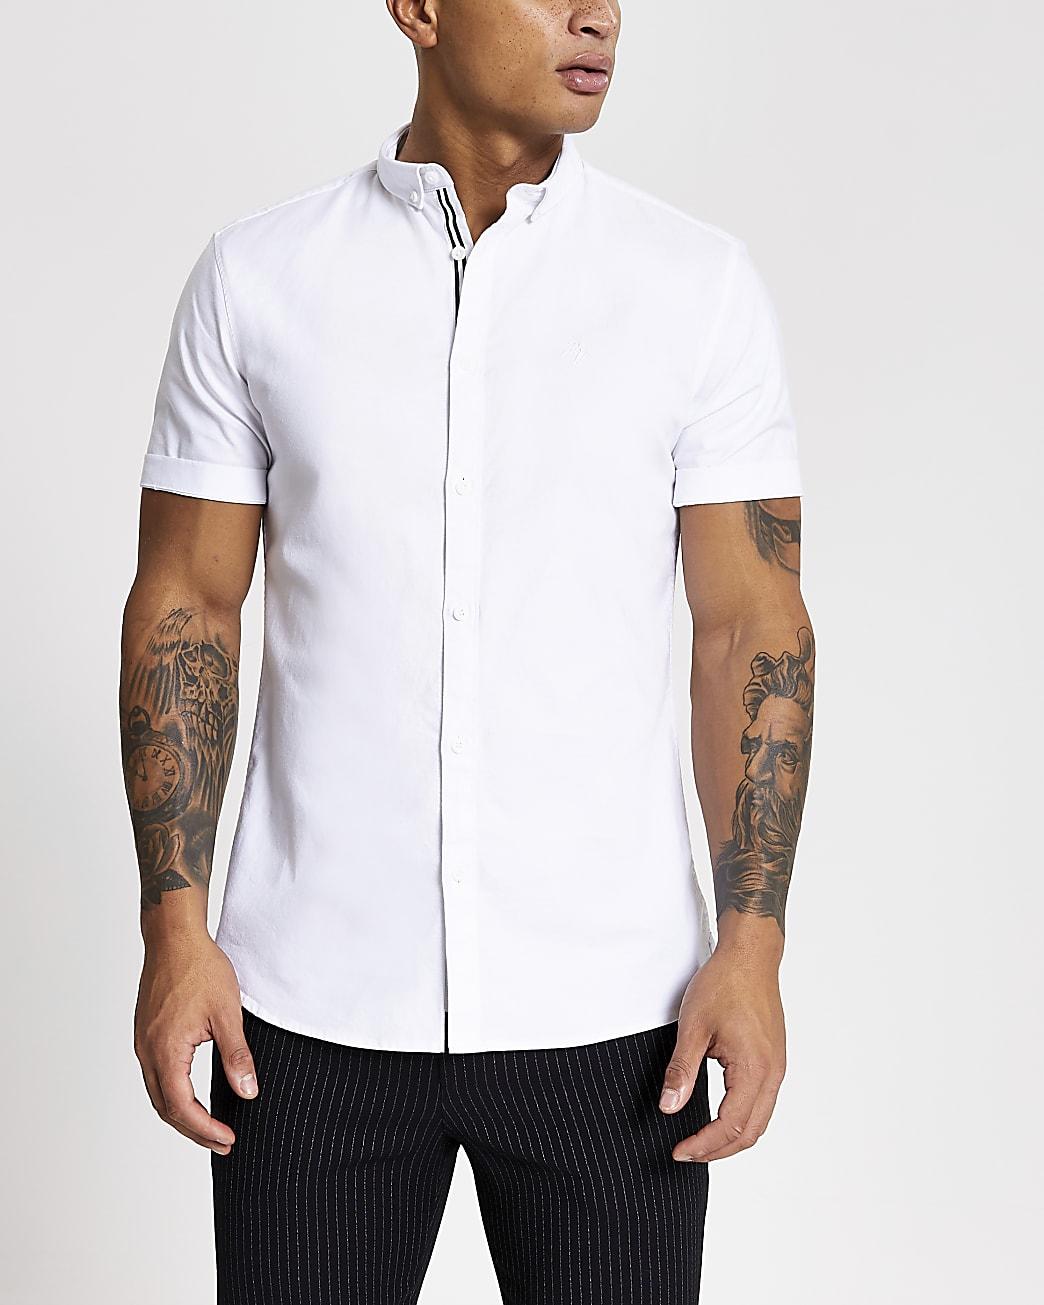 Maison Riviera white slim short sleeve shirt